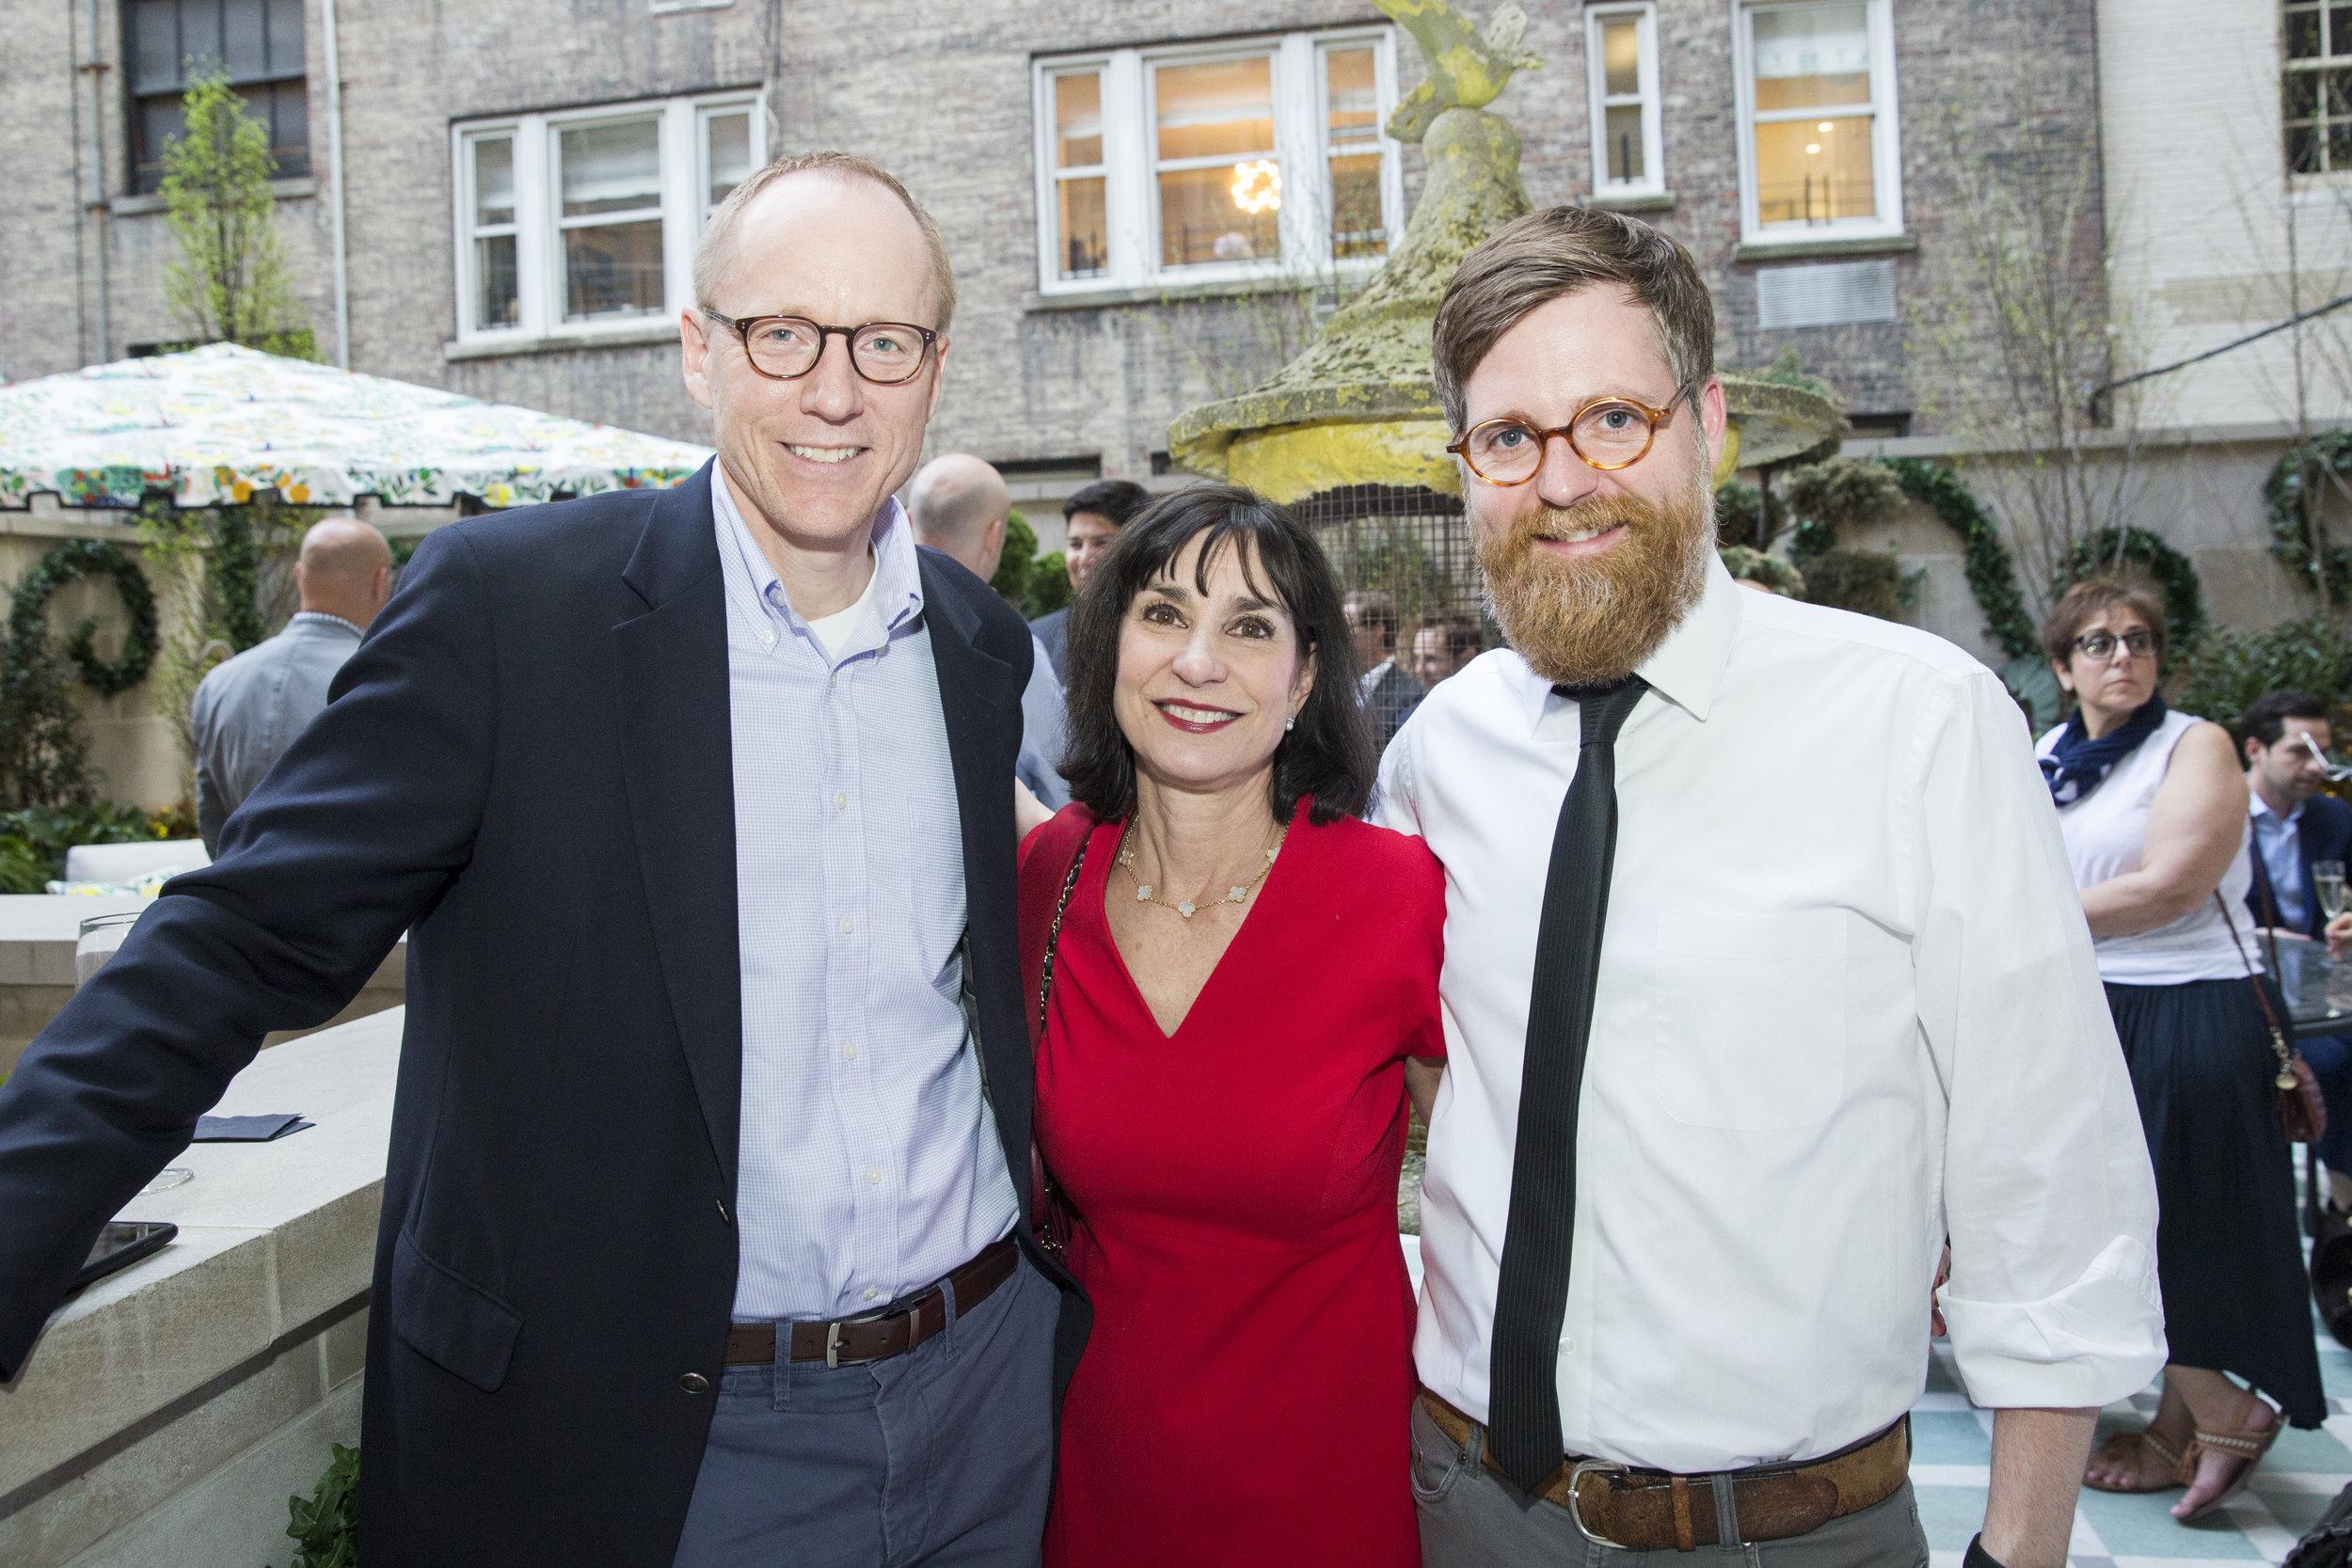 House Beautiful's Brenda Saget (center), with Kohler's John Engberg (left), and Camm Rowland (right)